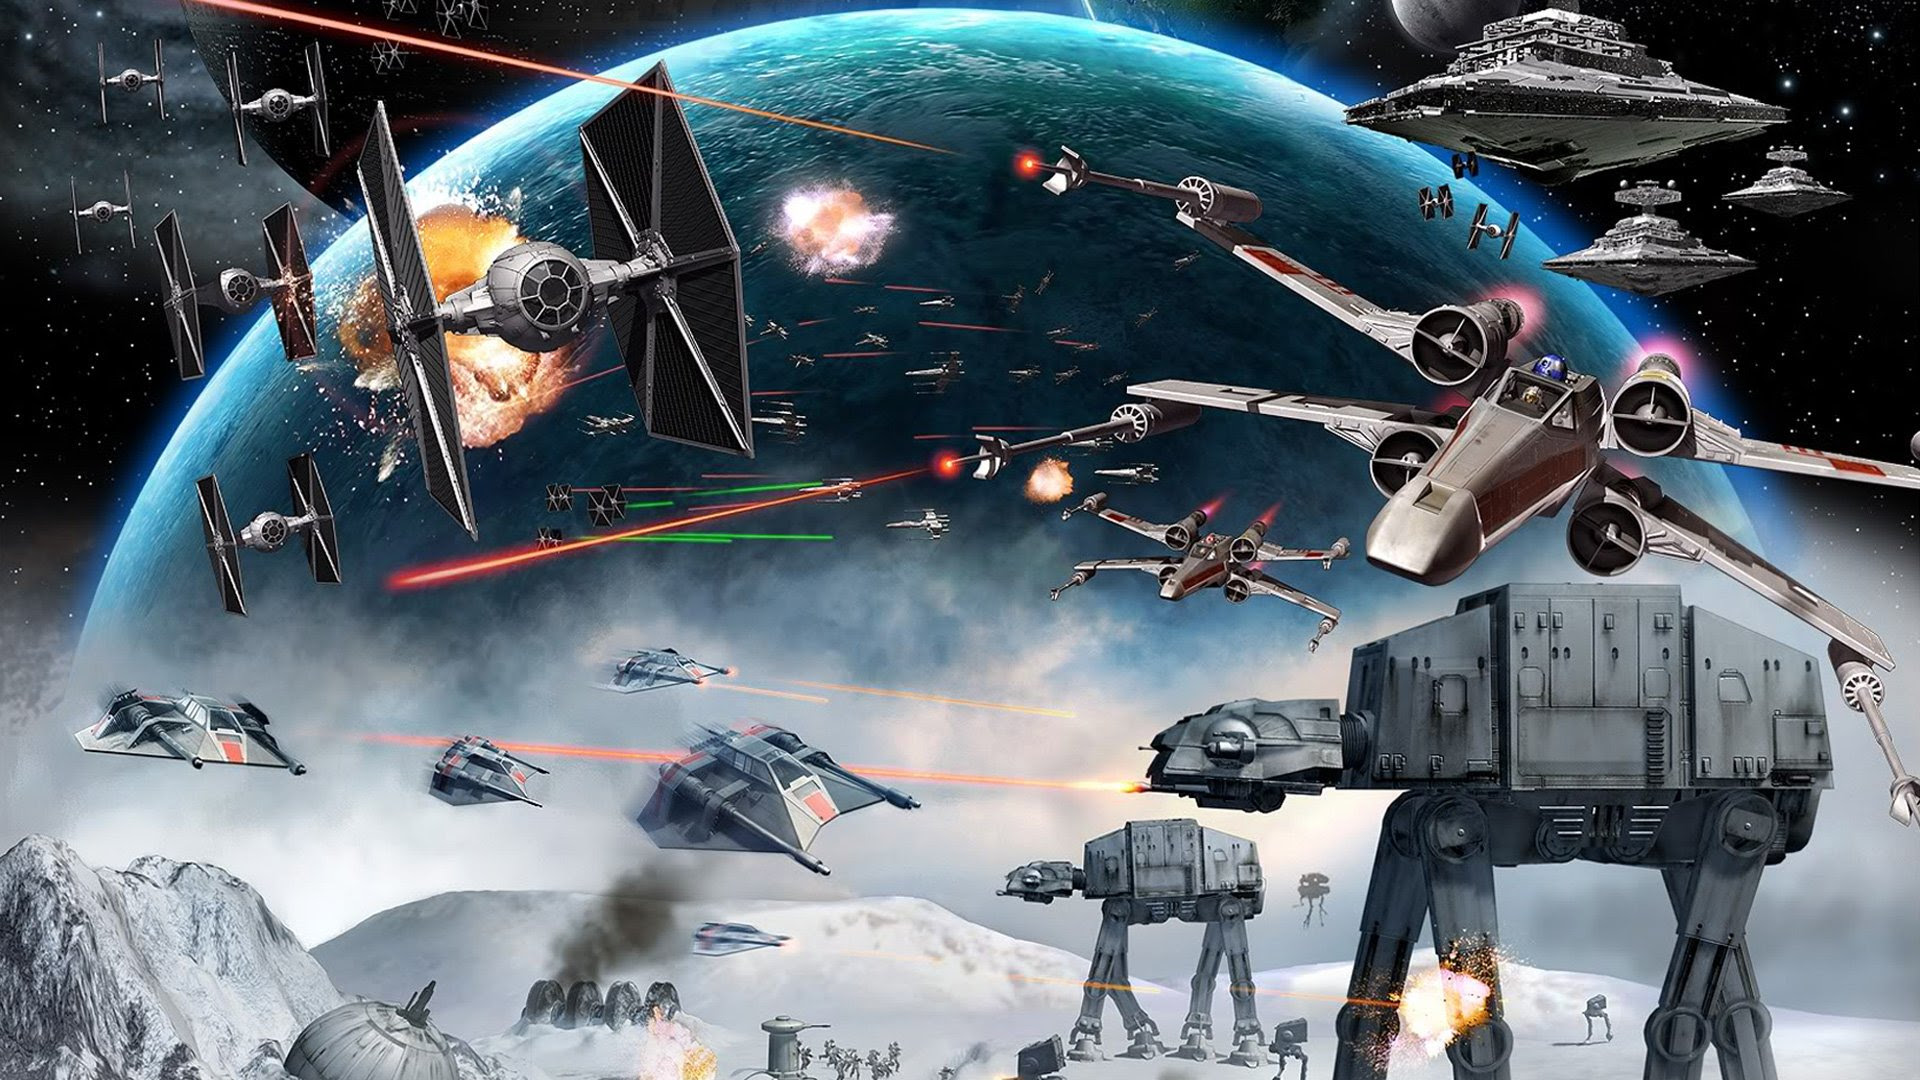 Free Download Ster Wars Afbeeldingen Ster Wars The Force Awakens